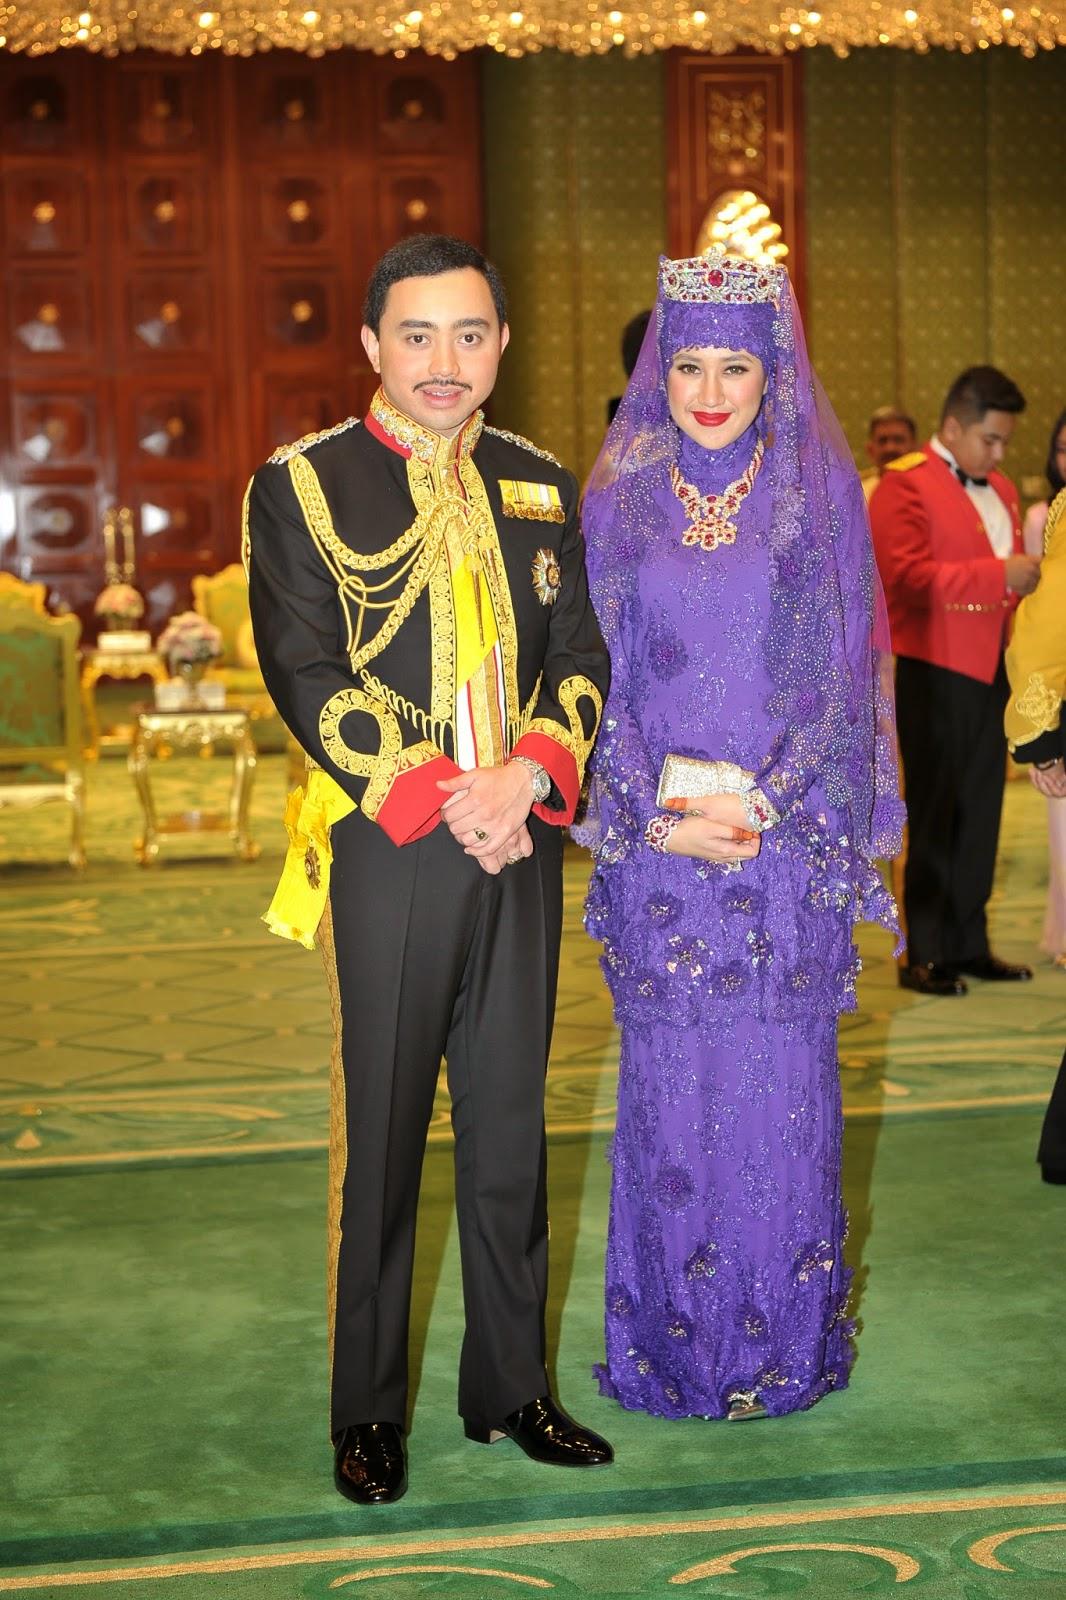 kee hua chee live hrh sultan ahmad shah of pahang and